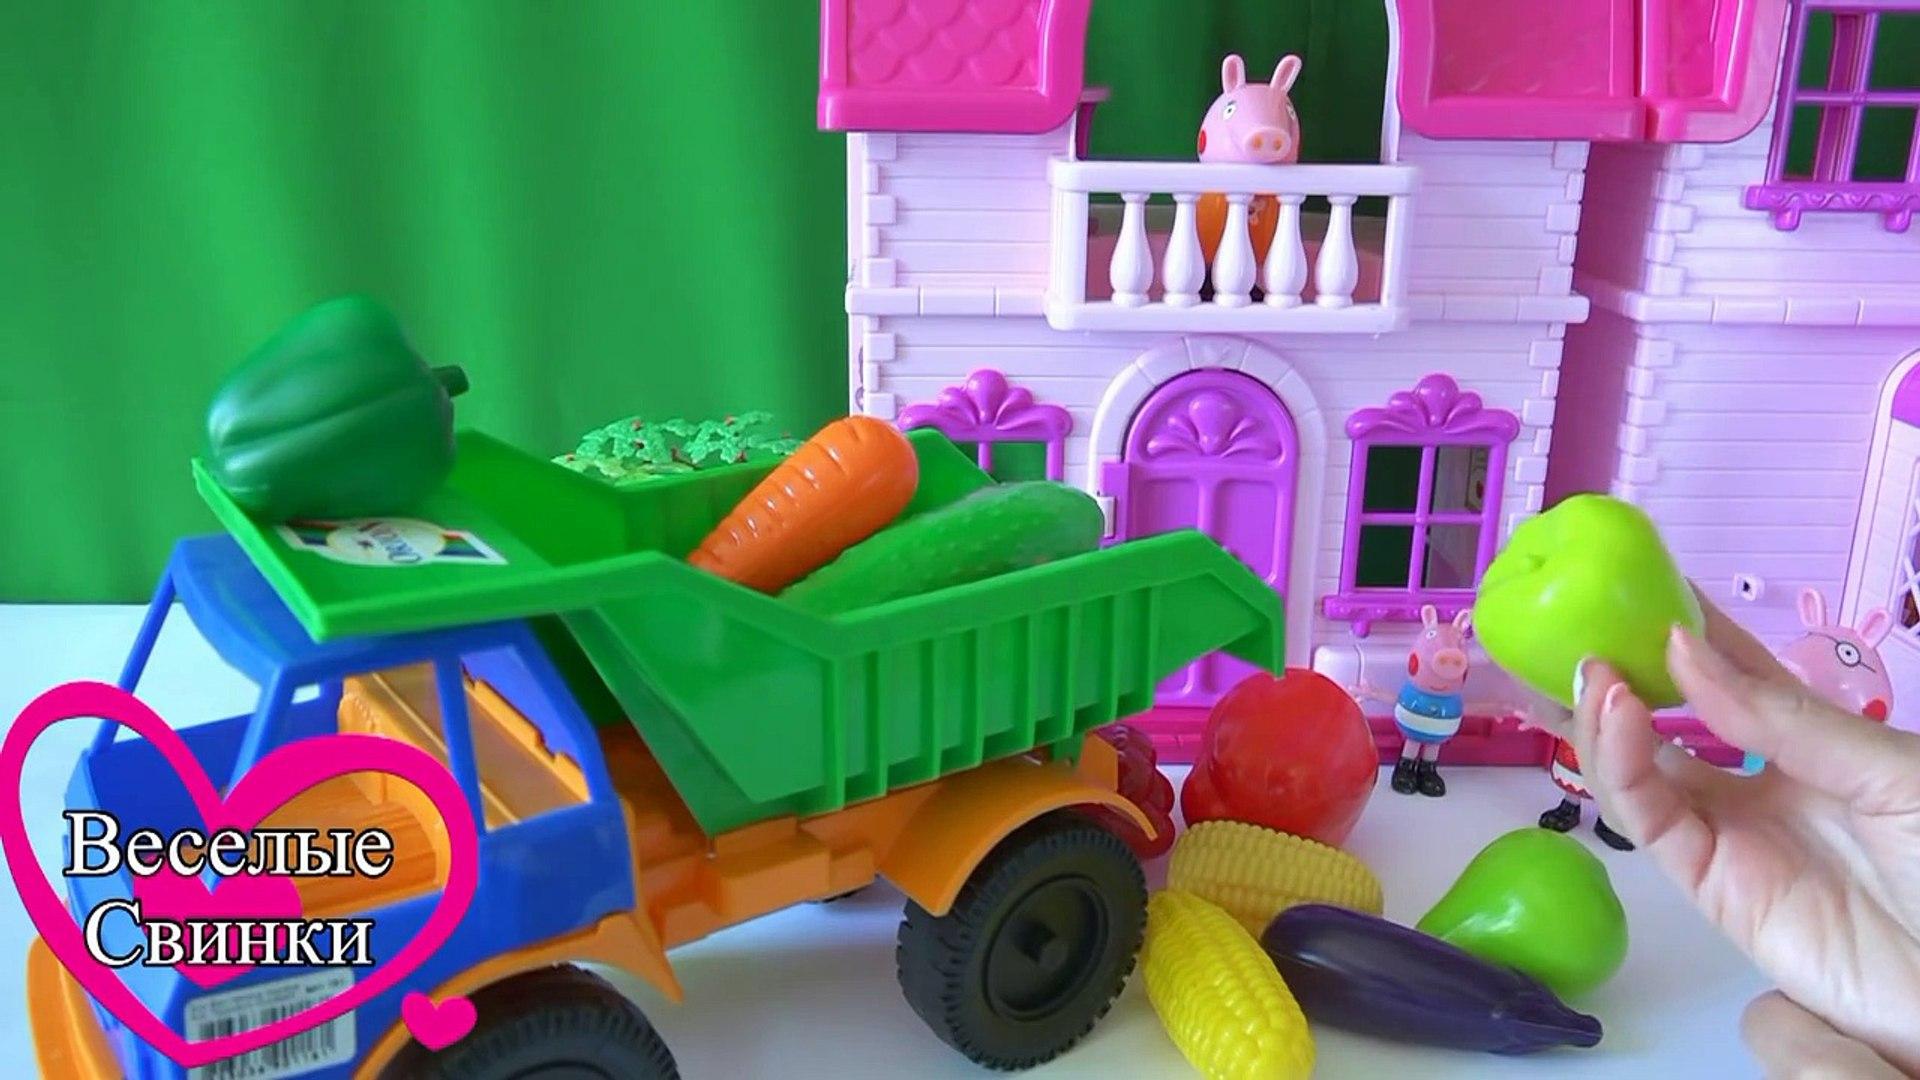 Свинка Пеппа Учим Овощи, видео с игрушками на русском серия 5